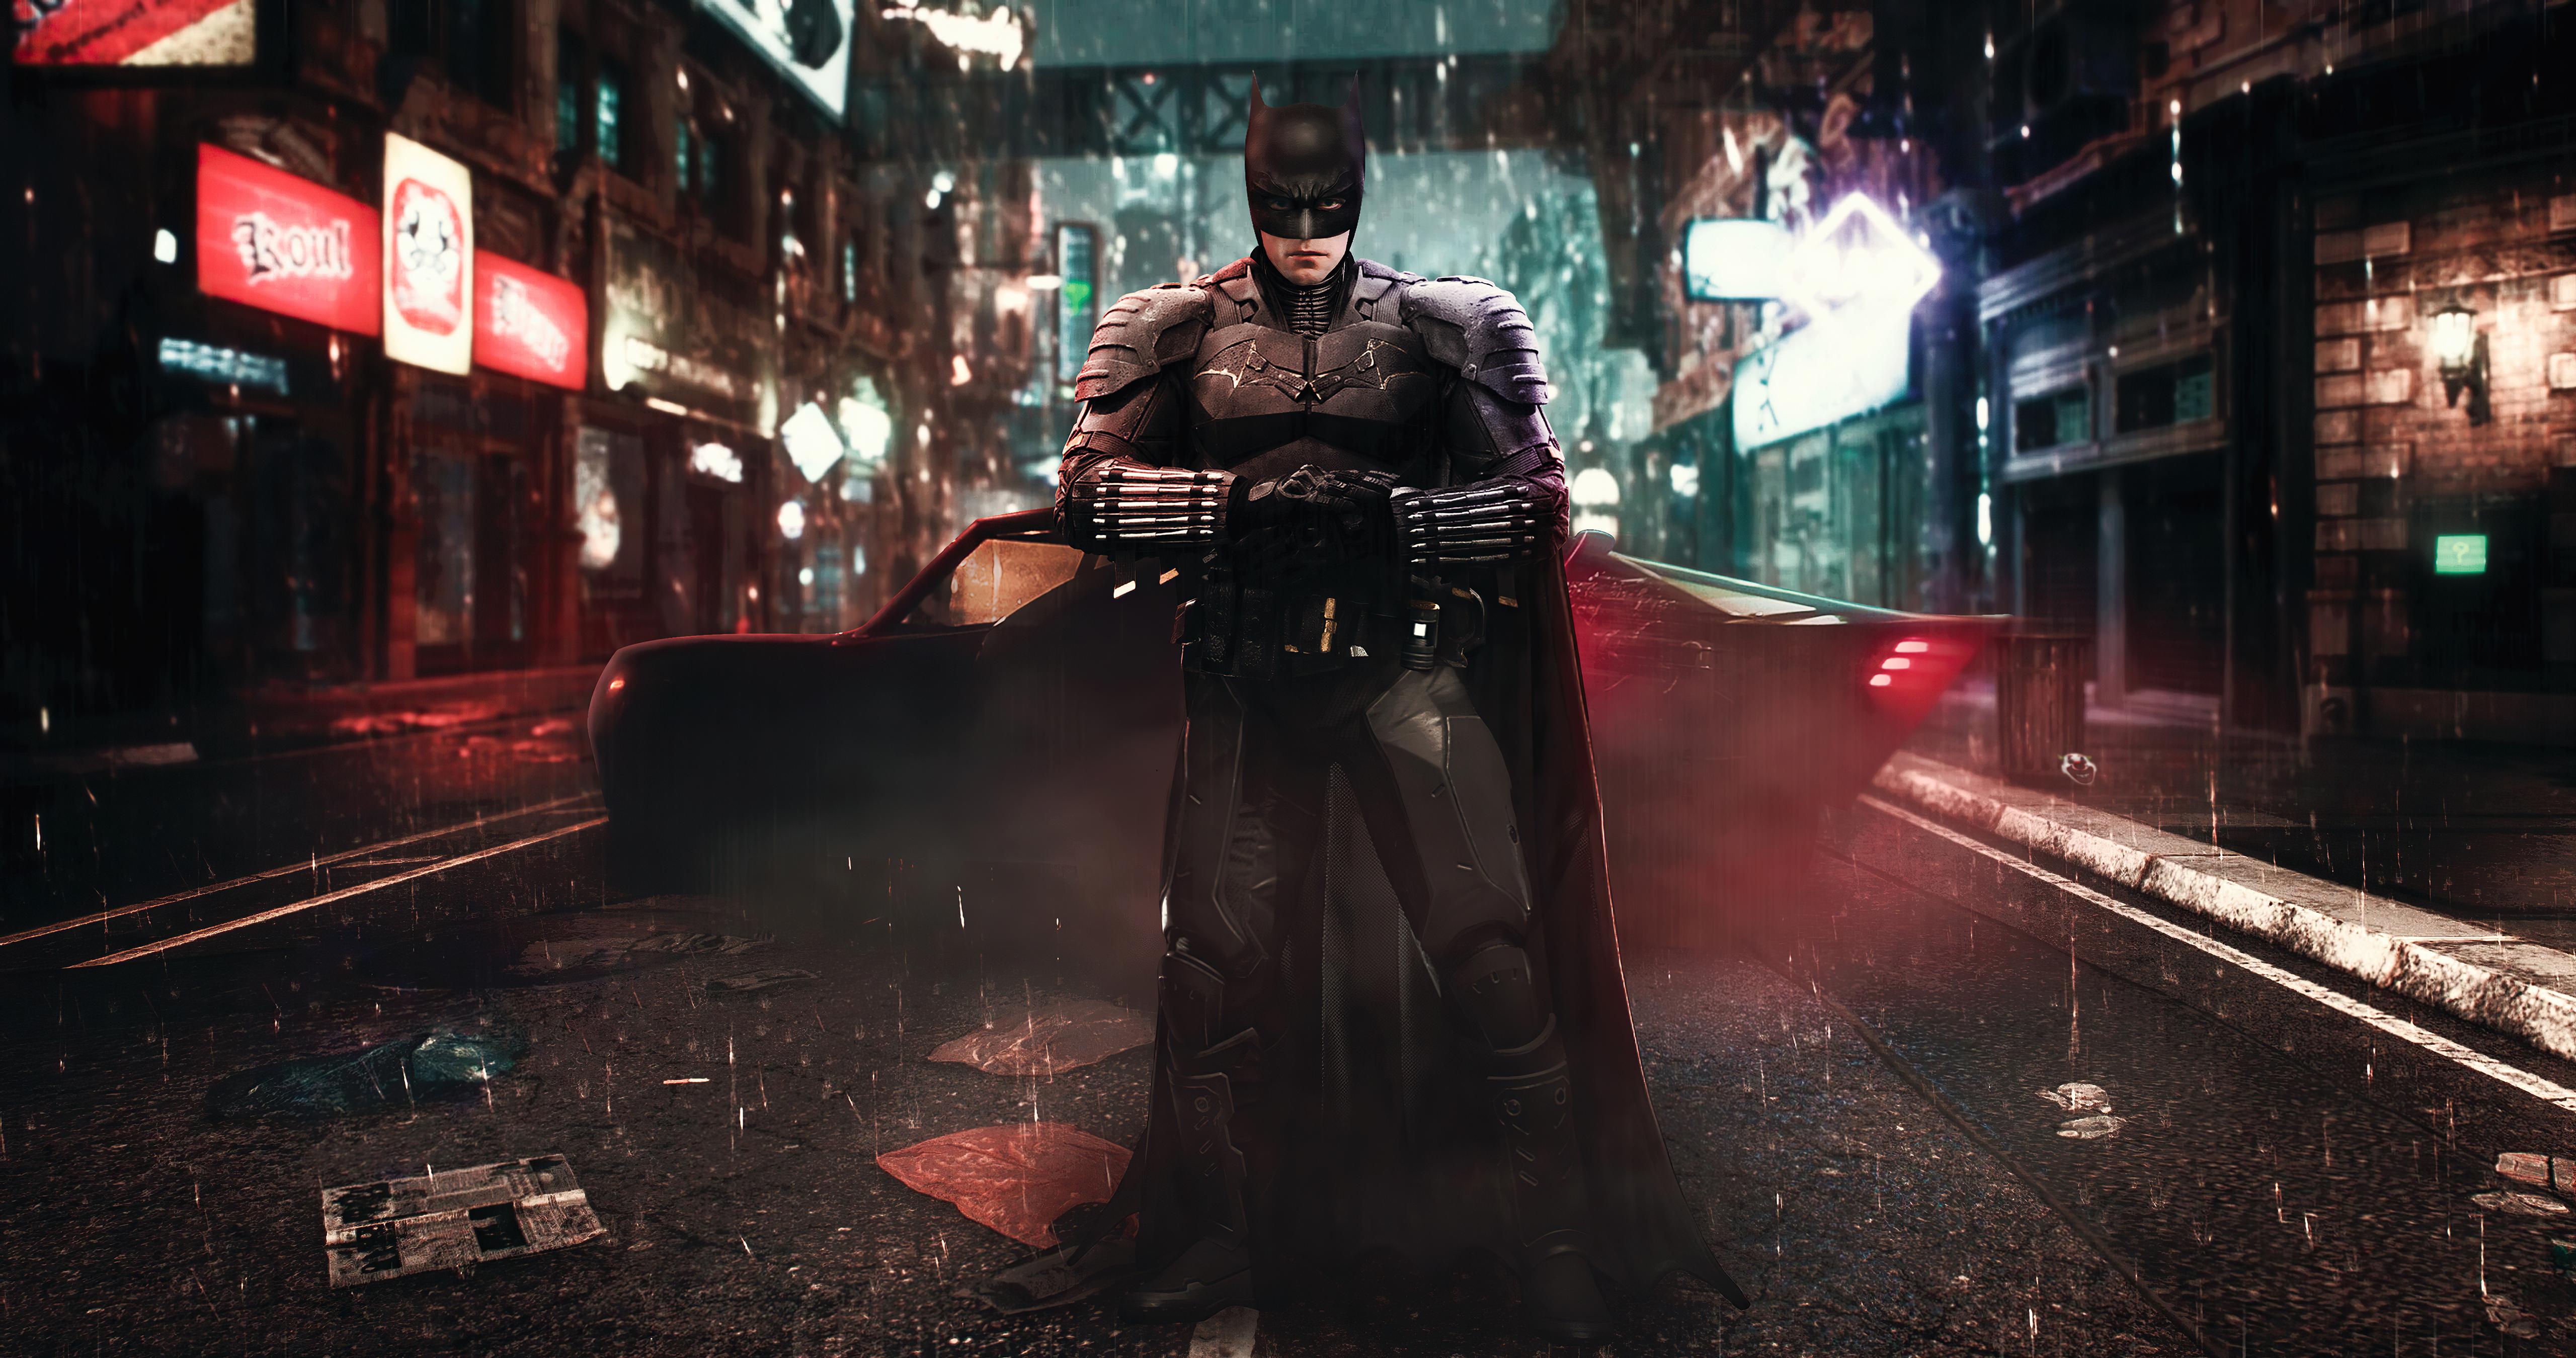 batman robert pattinson 4k 1619216532 - Batman Robert Pattinson 4k - Batman Robert Pattinson 4k wallpapers